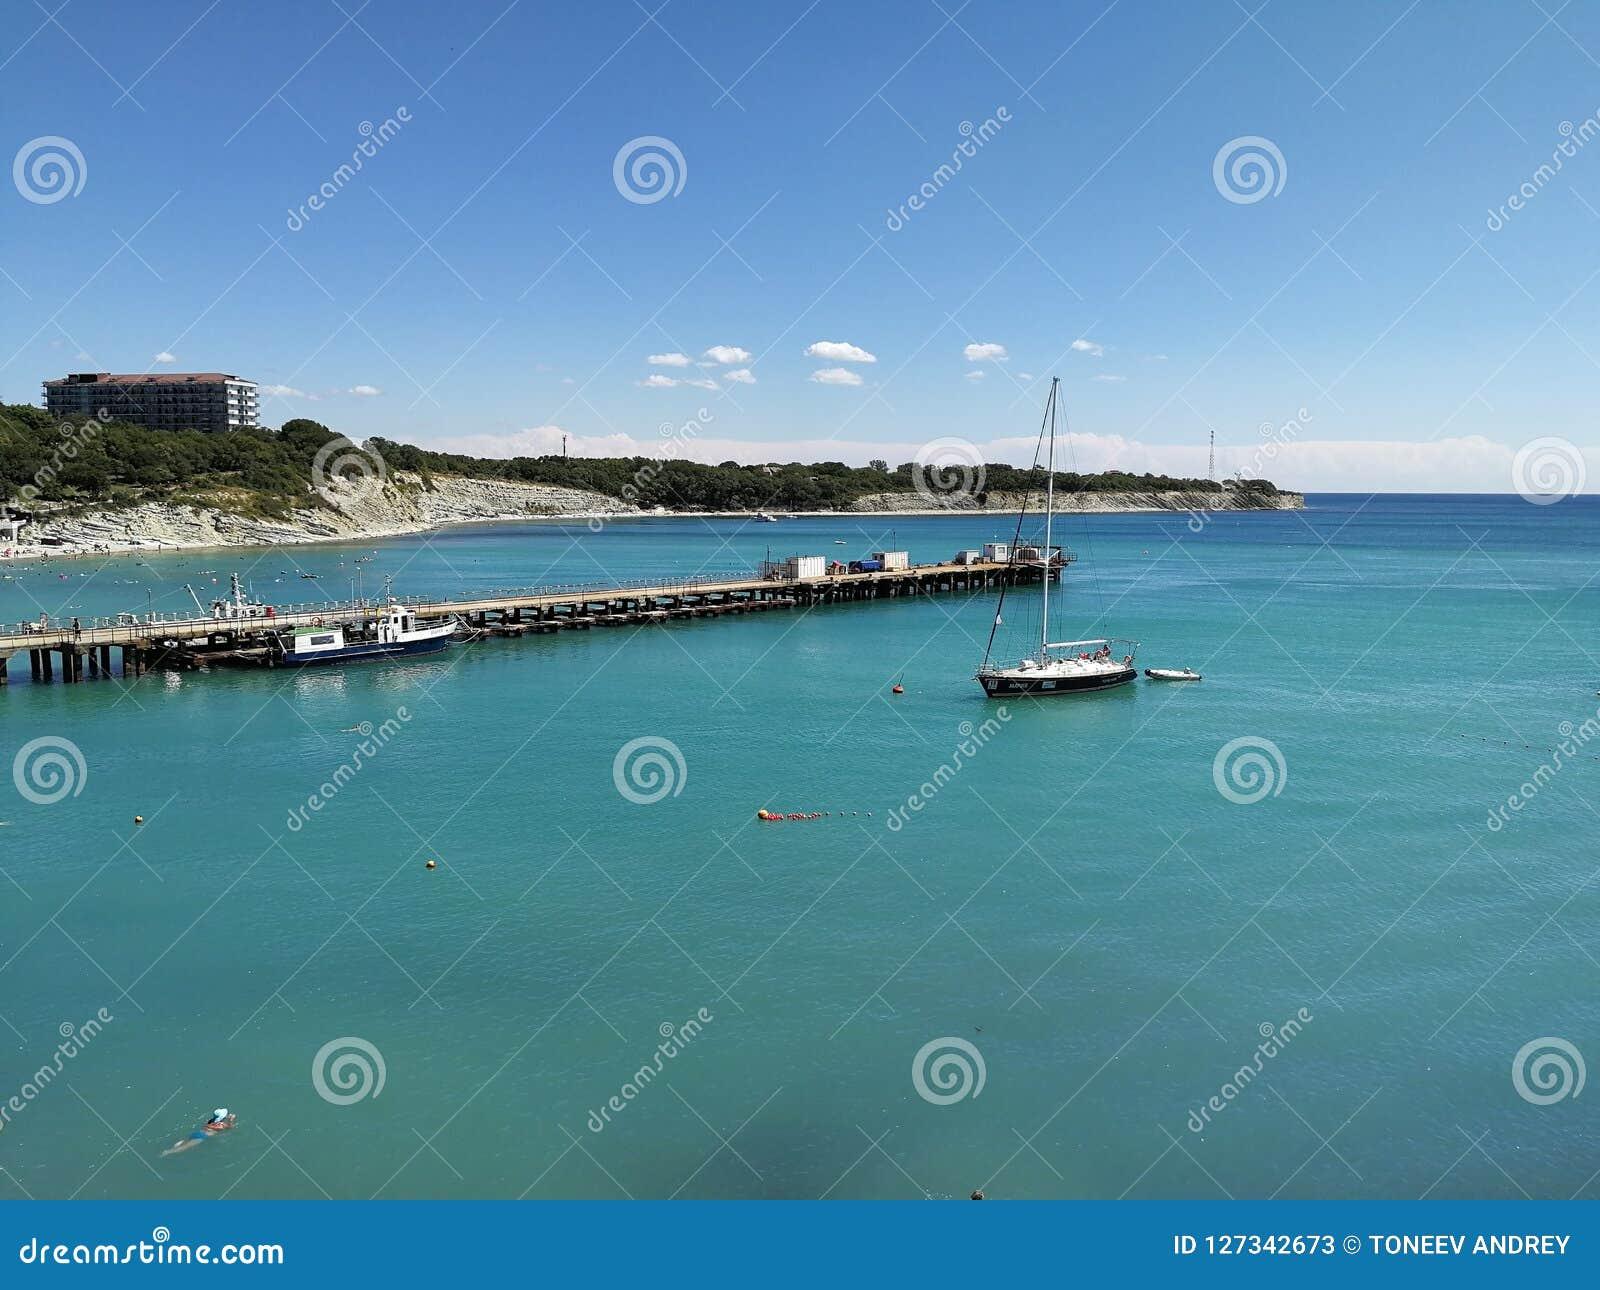 Russian coast Gelendzhik Black Sea Caucasus Krasnodar Region